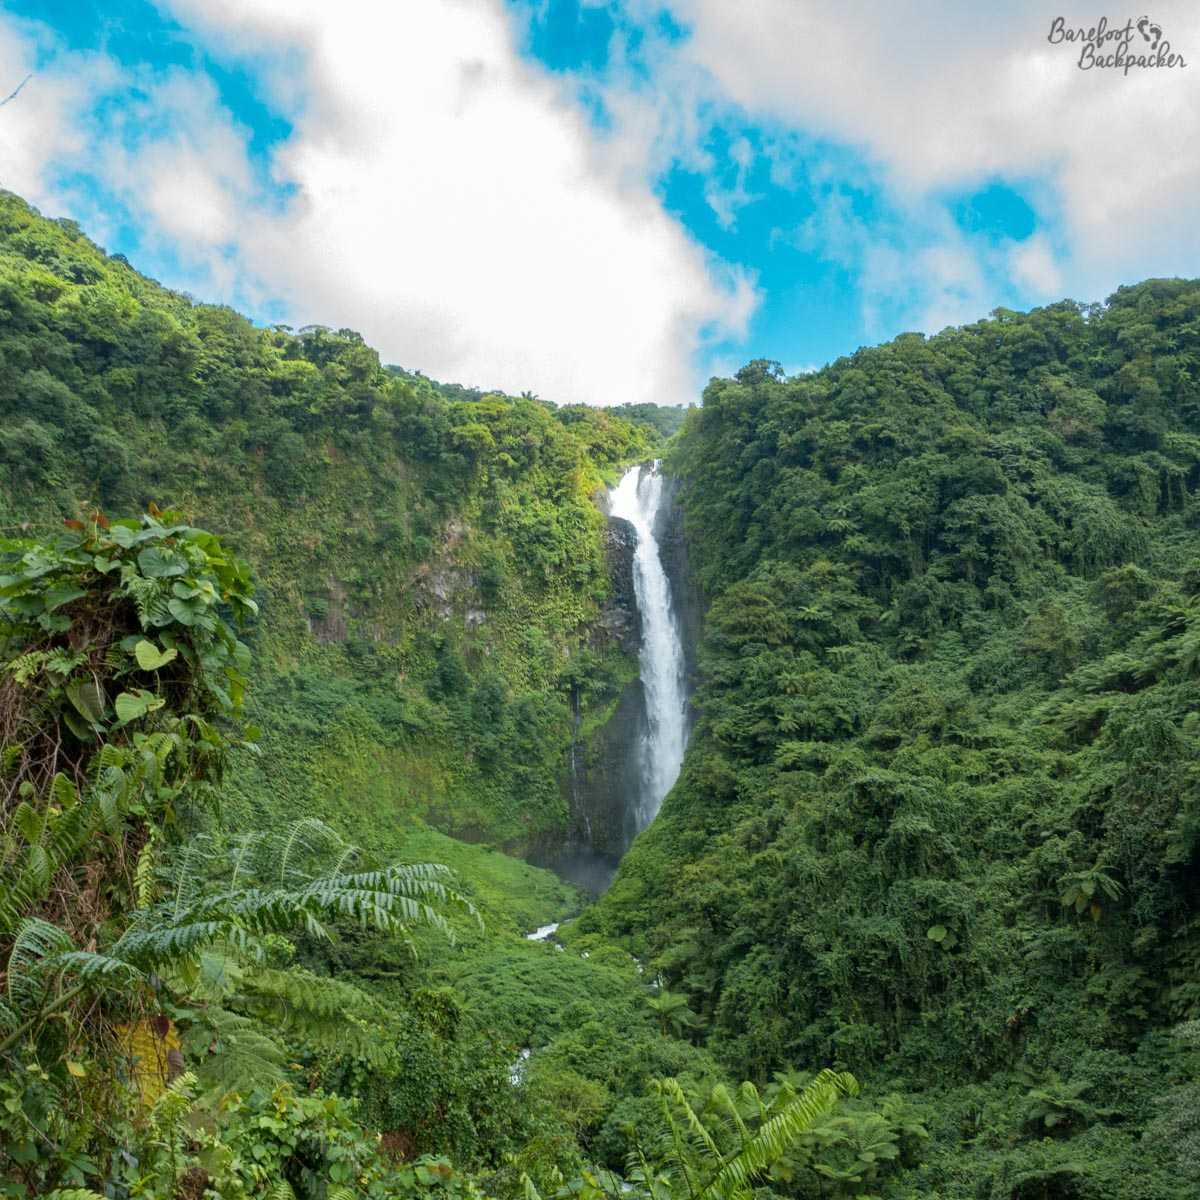 Siri Waterfall, Gaua, as seen from 45min trek away.